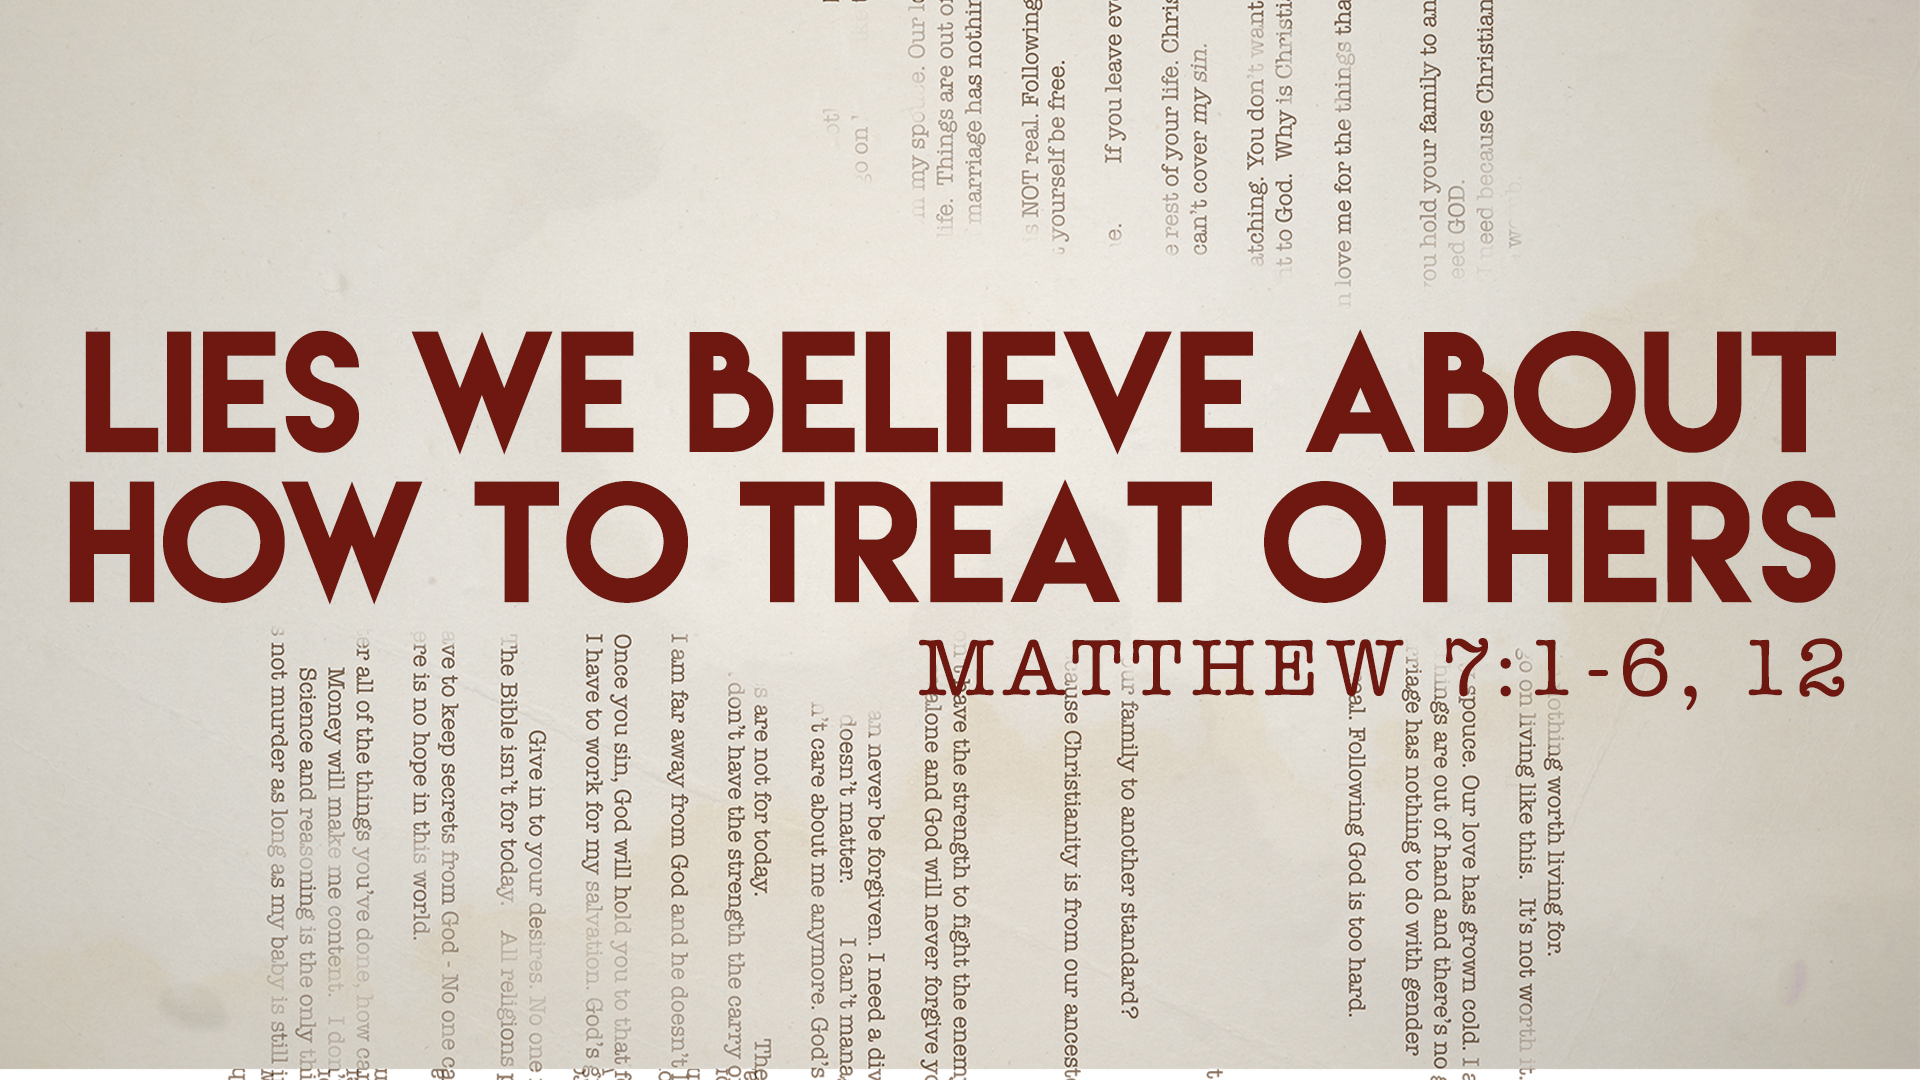 Matthew 7: 1 -6, 12